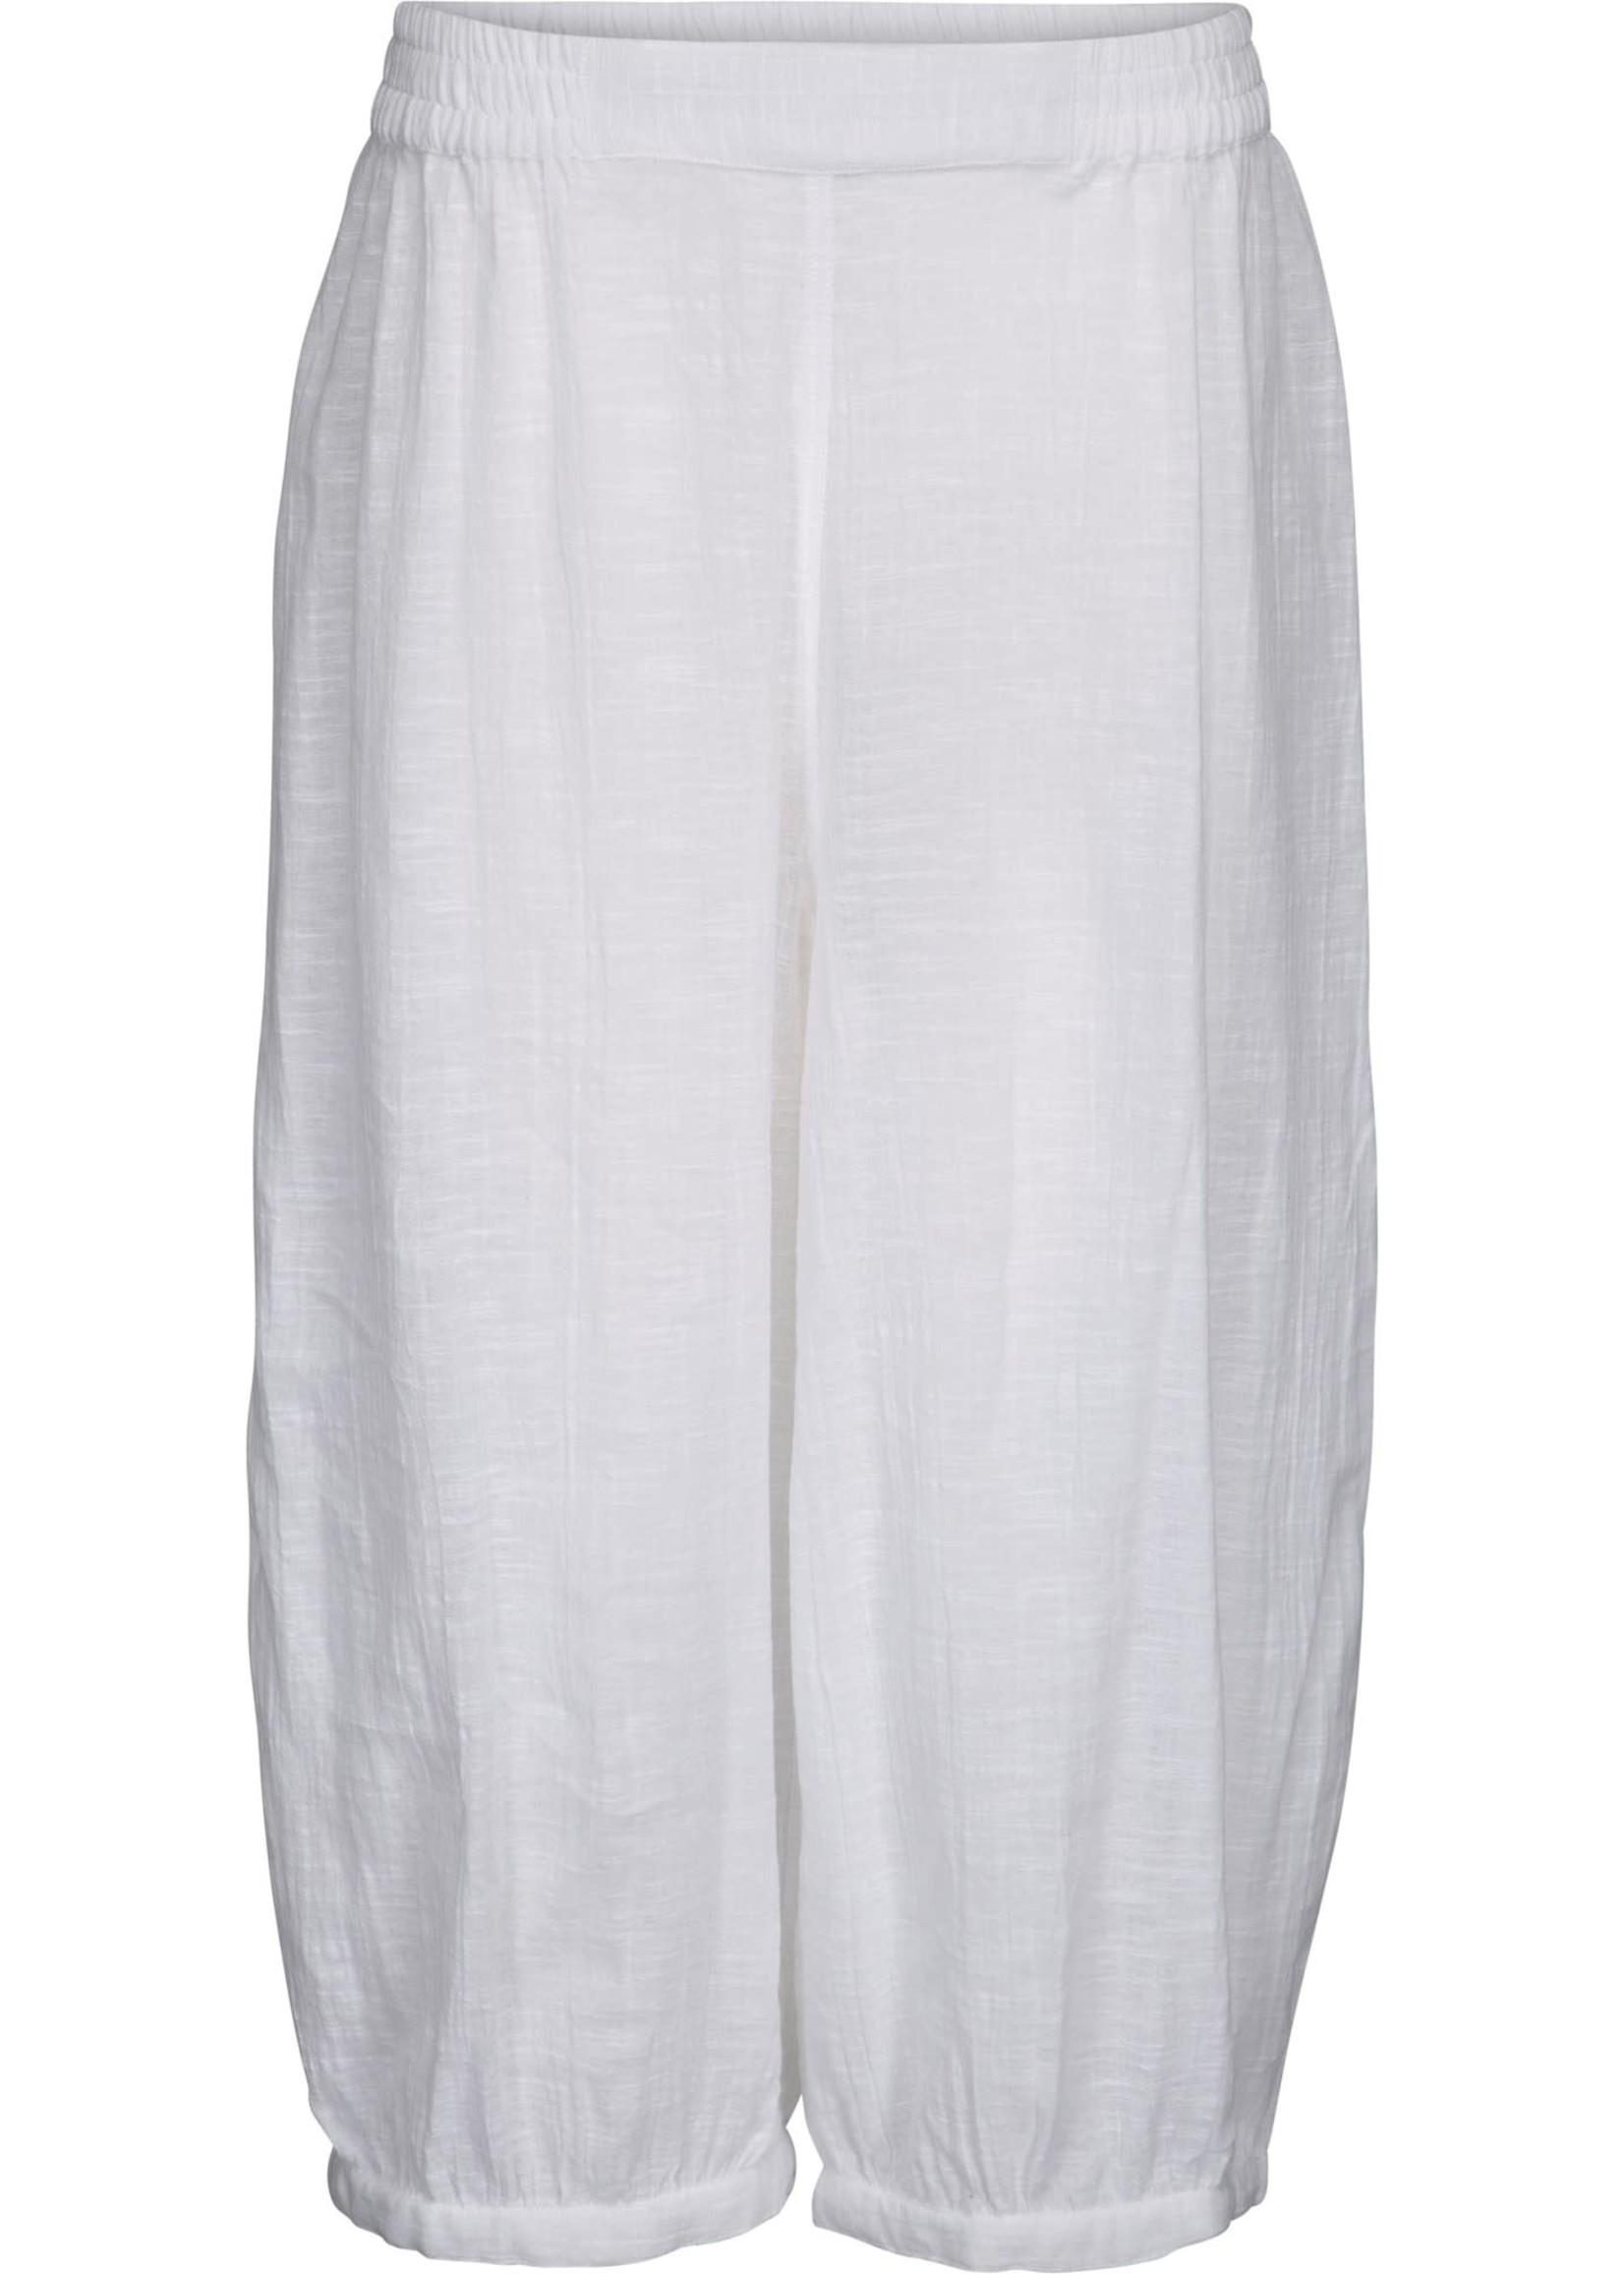 TWO DANES 36574 302 Gizelle Cotton Gauze Trousers